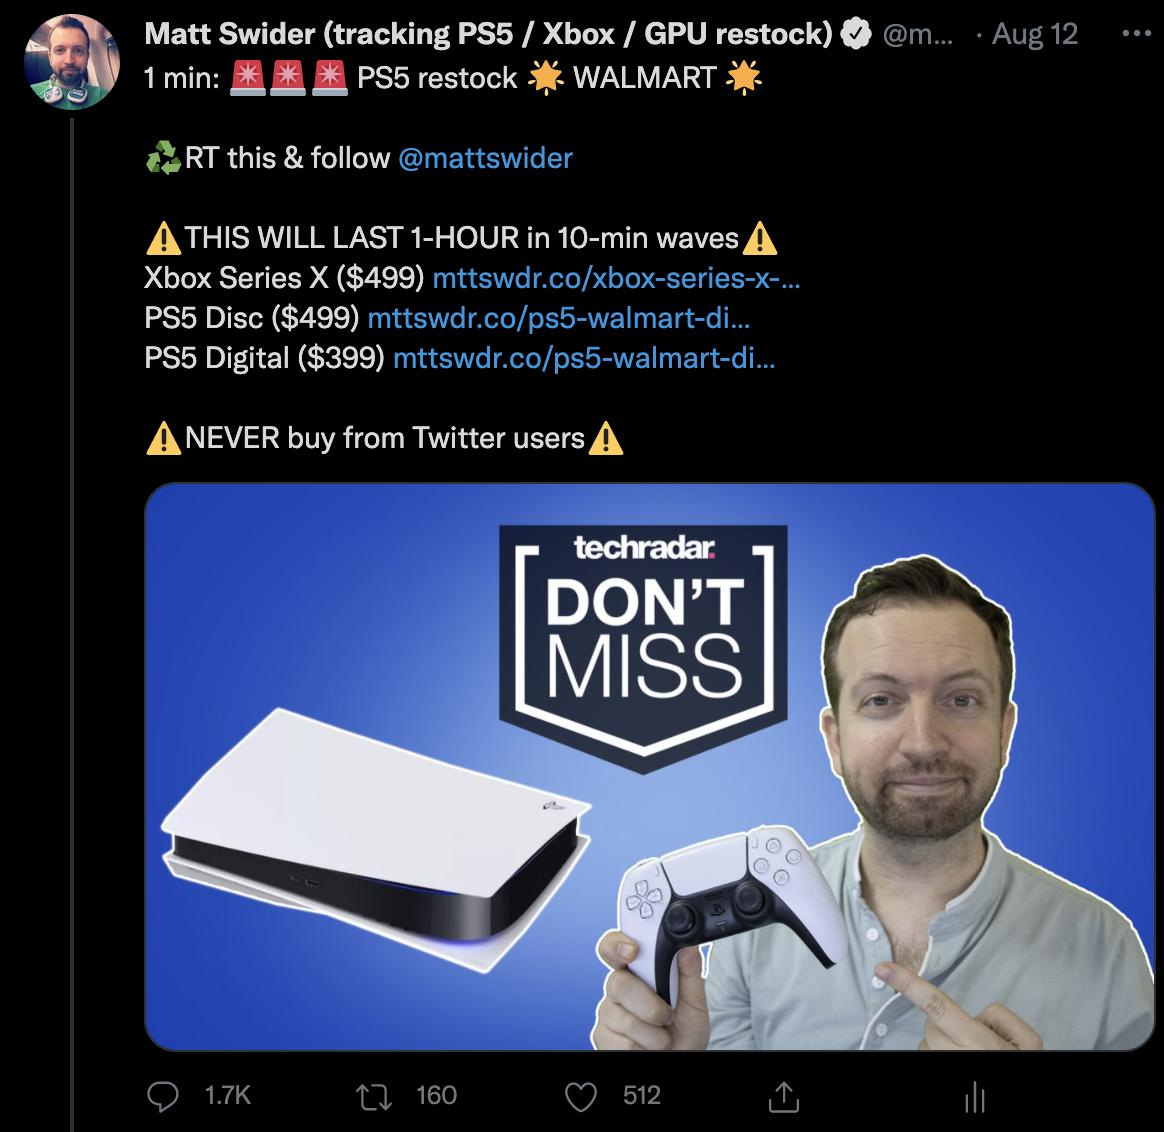 PS5 restock Twitter tracker alert for Walmart from Matt Swider